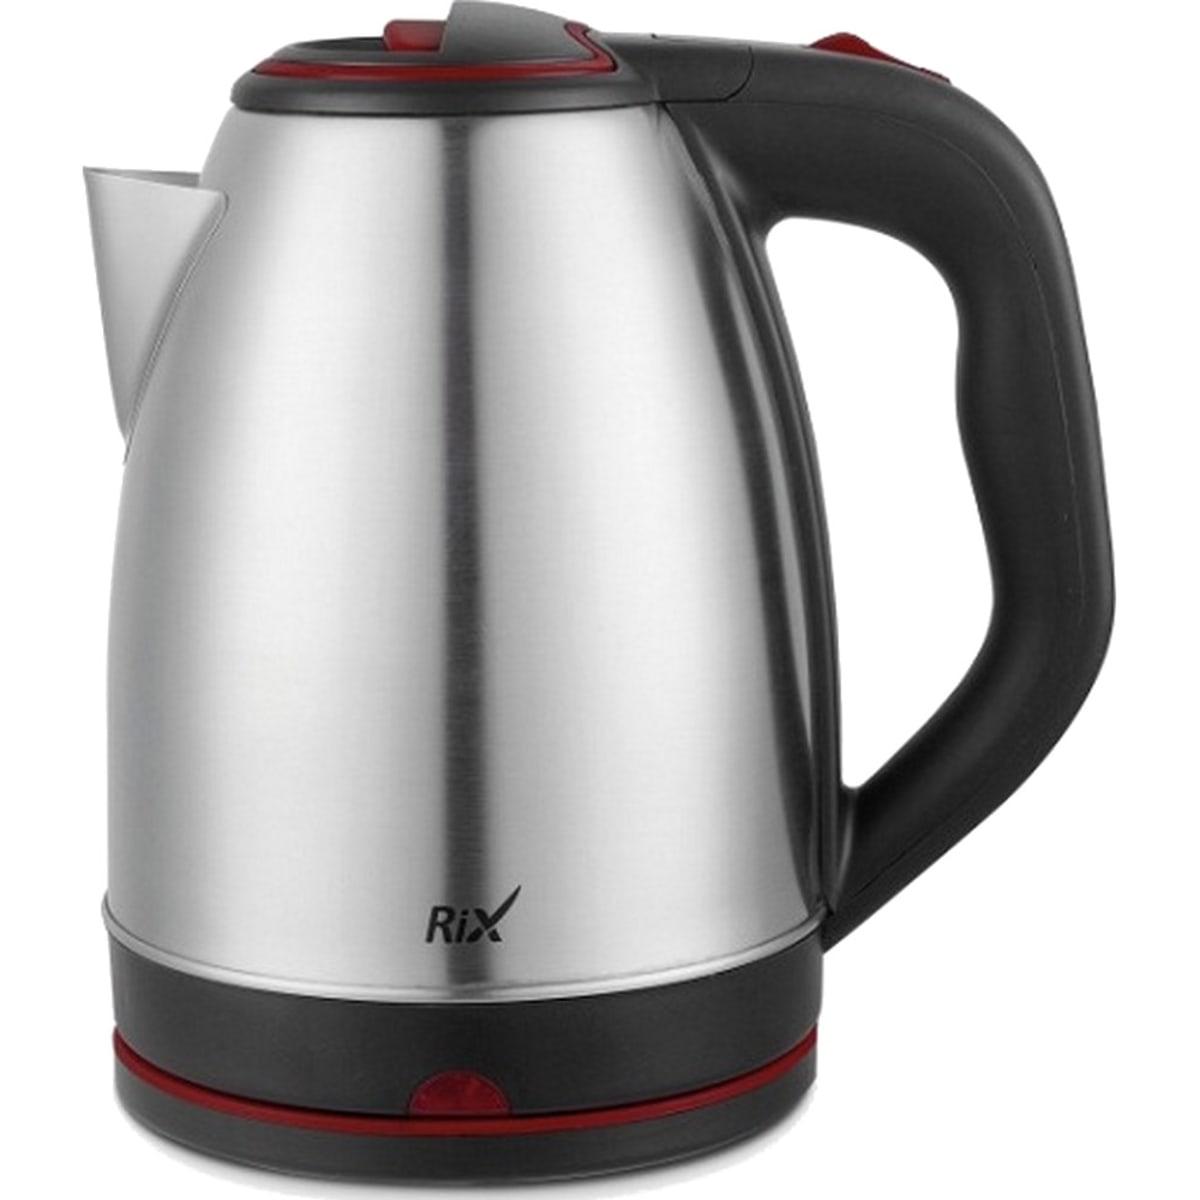 Электрический чайник RIX RKT-1801S, 1.8 л